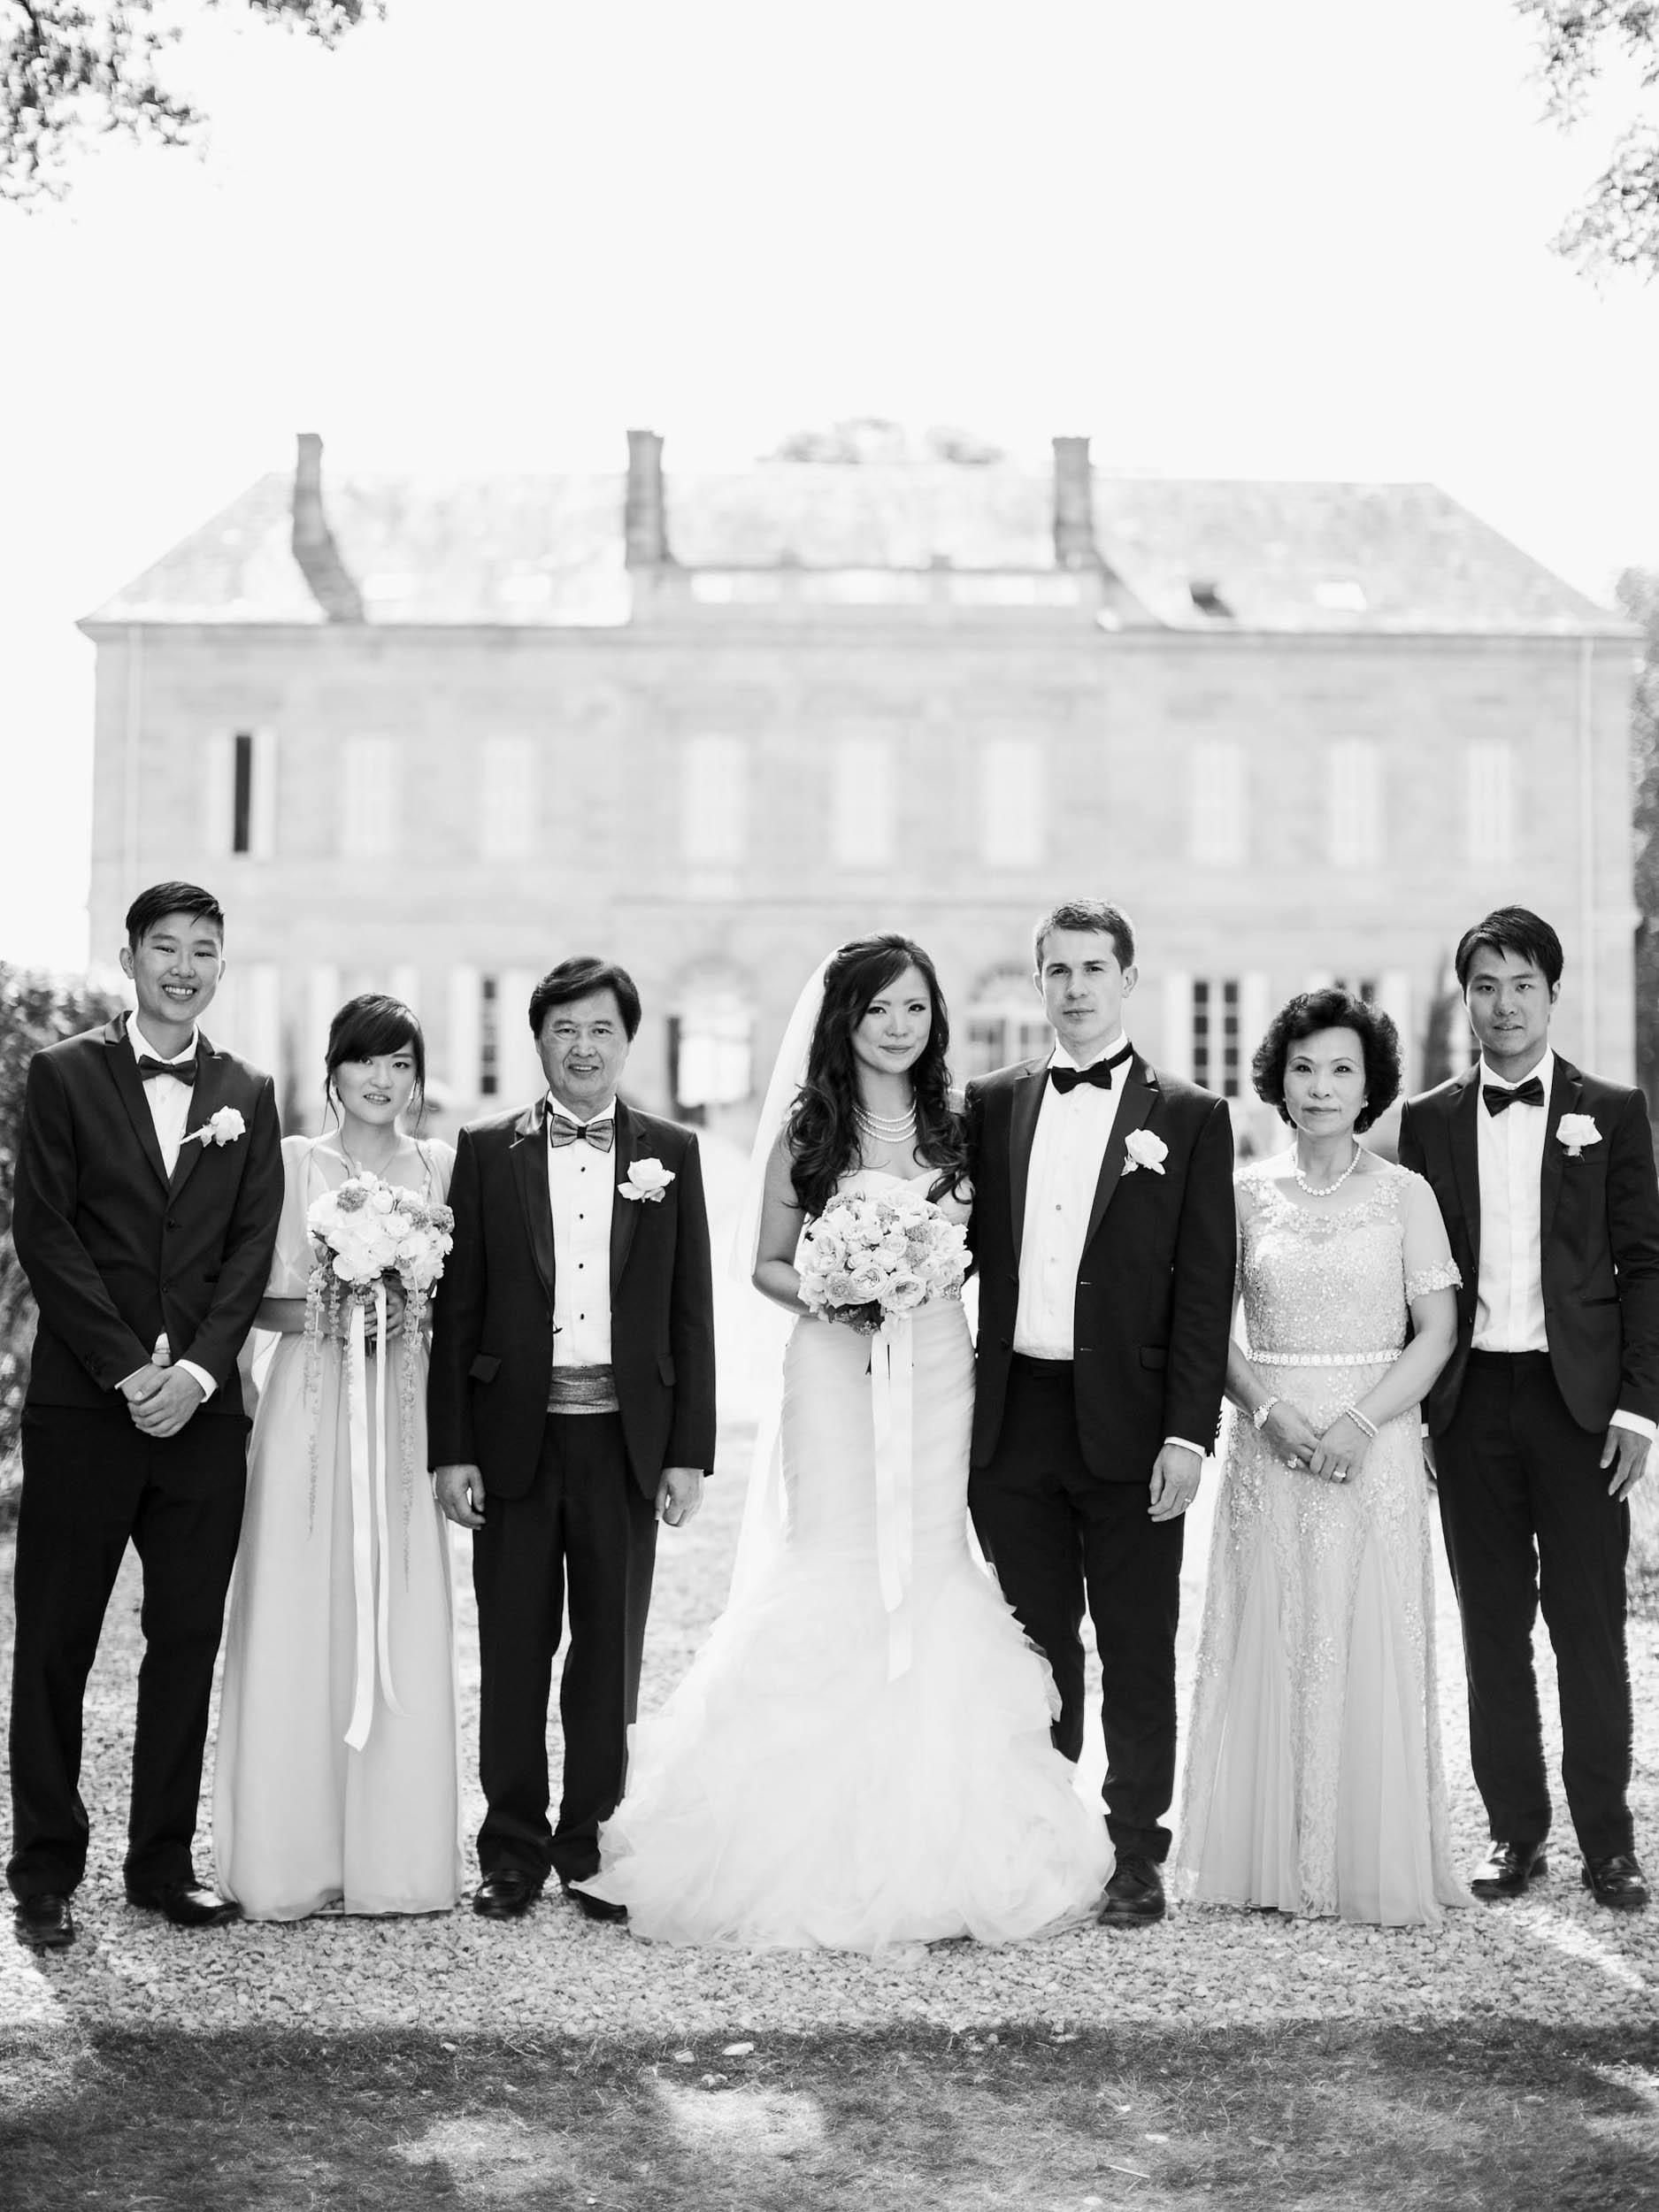 Amy O'Boyle Photography- Destination & UK Fine Art Film Wedding Photographer- Chateau La Durantie Wedding-20.jpg